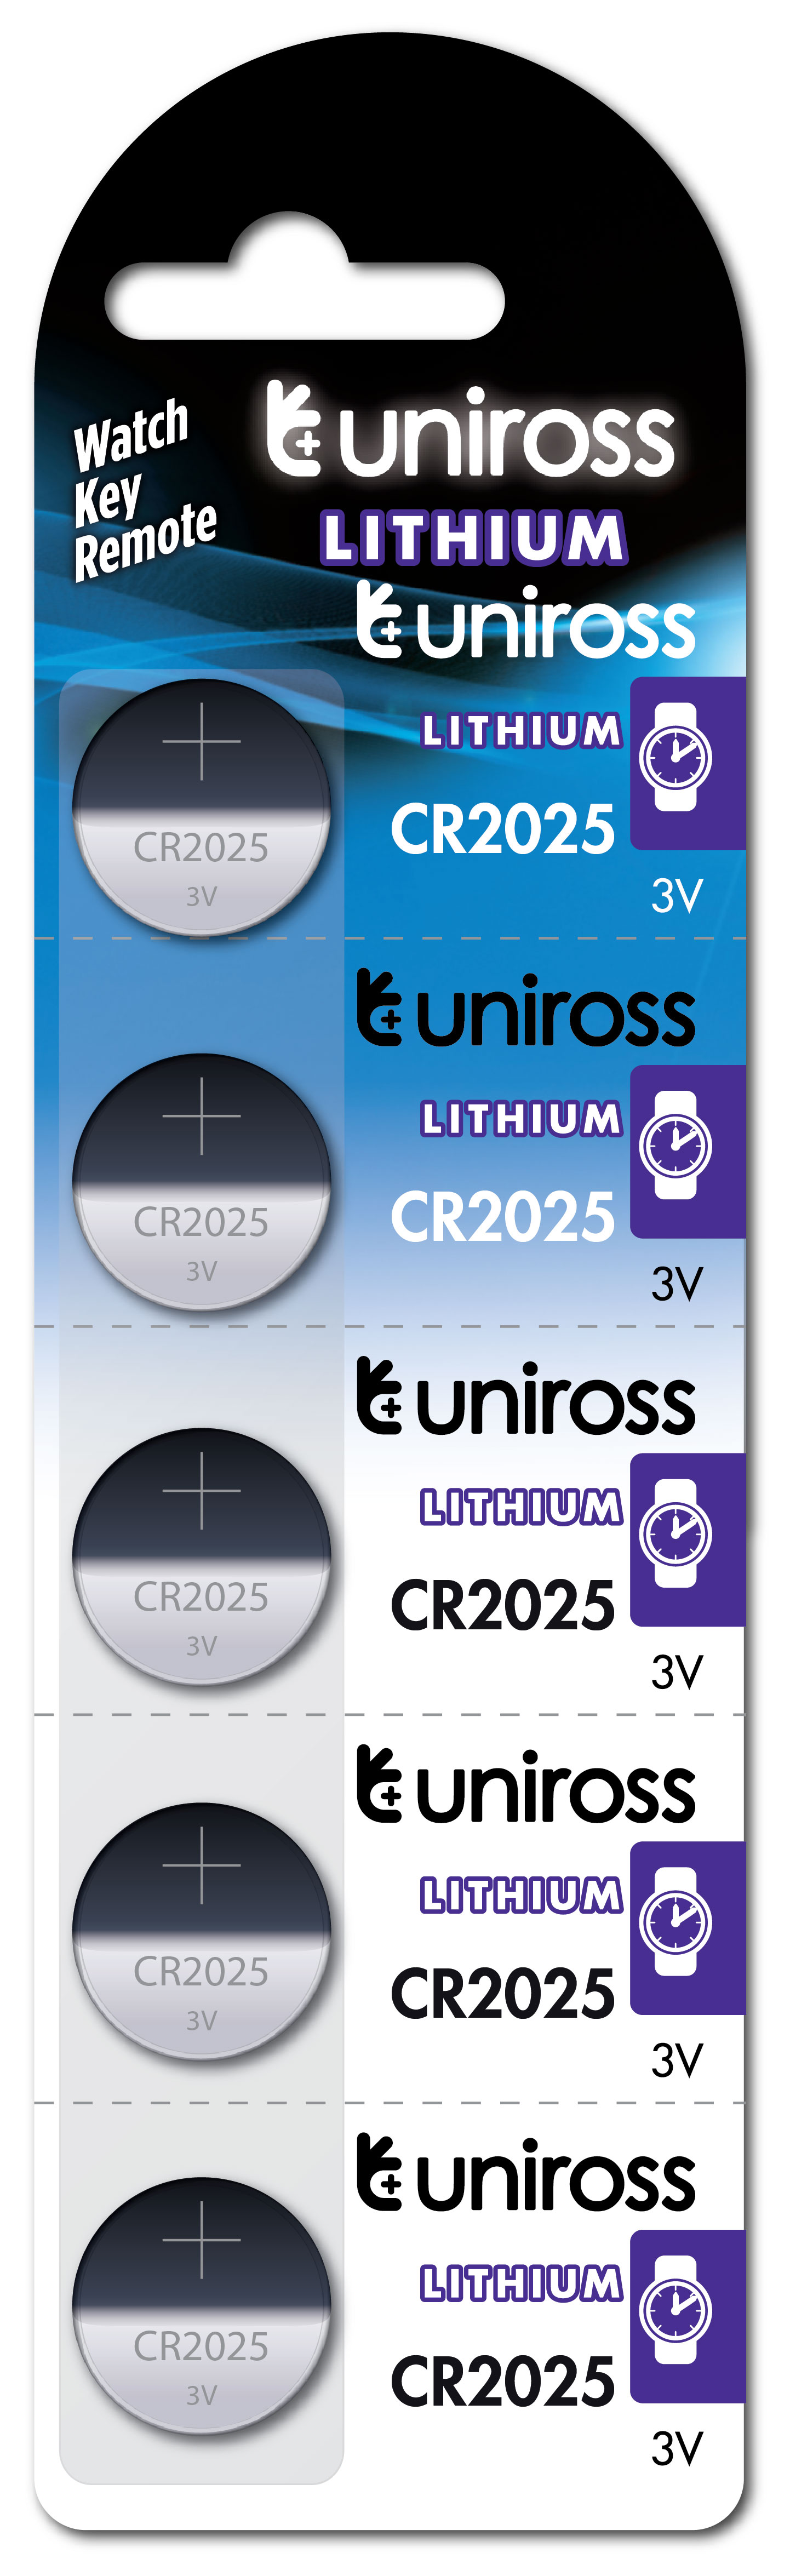 Button_Cell_[U5CR2025] UNIROSS BP5 CR2025 LITHIUM.jpg